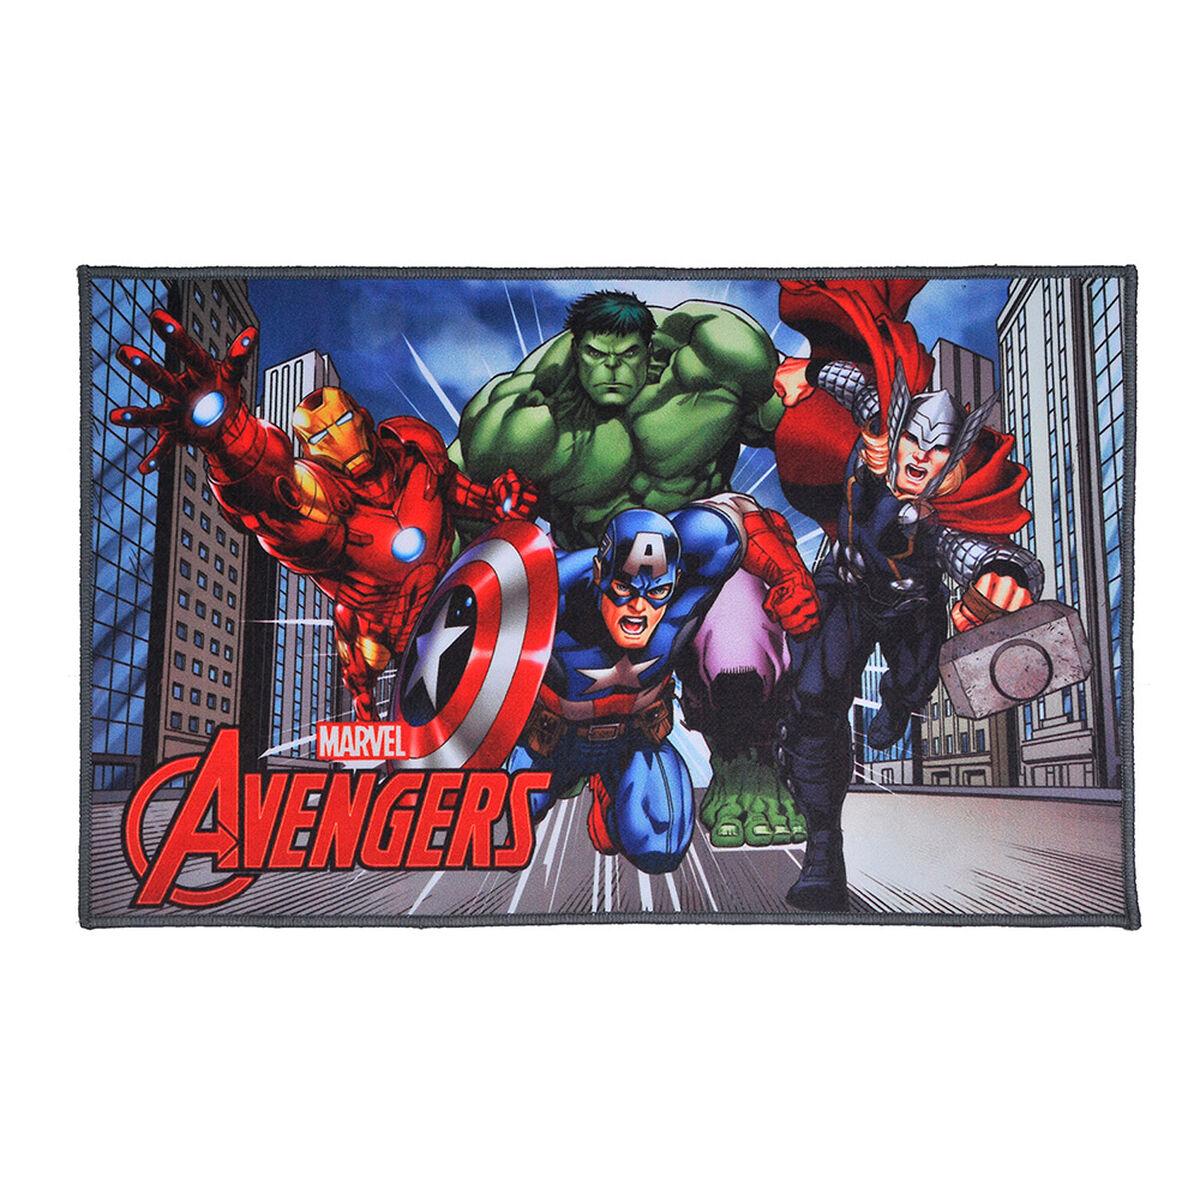 Bajada de Cama Avengers 80*120 cm